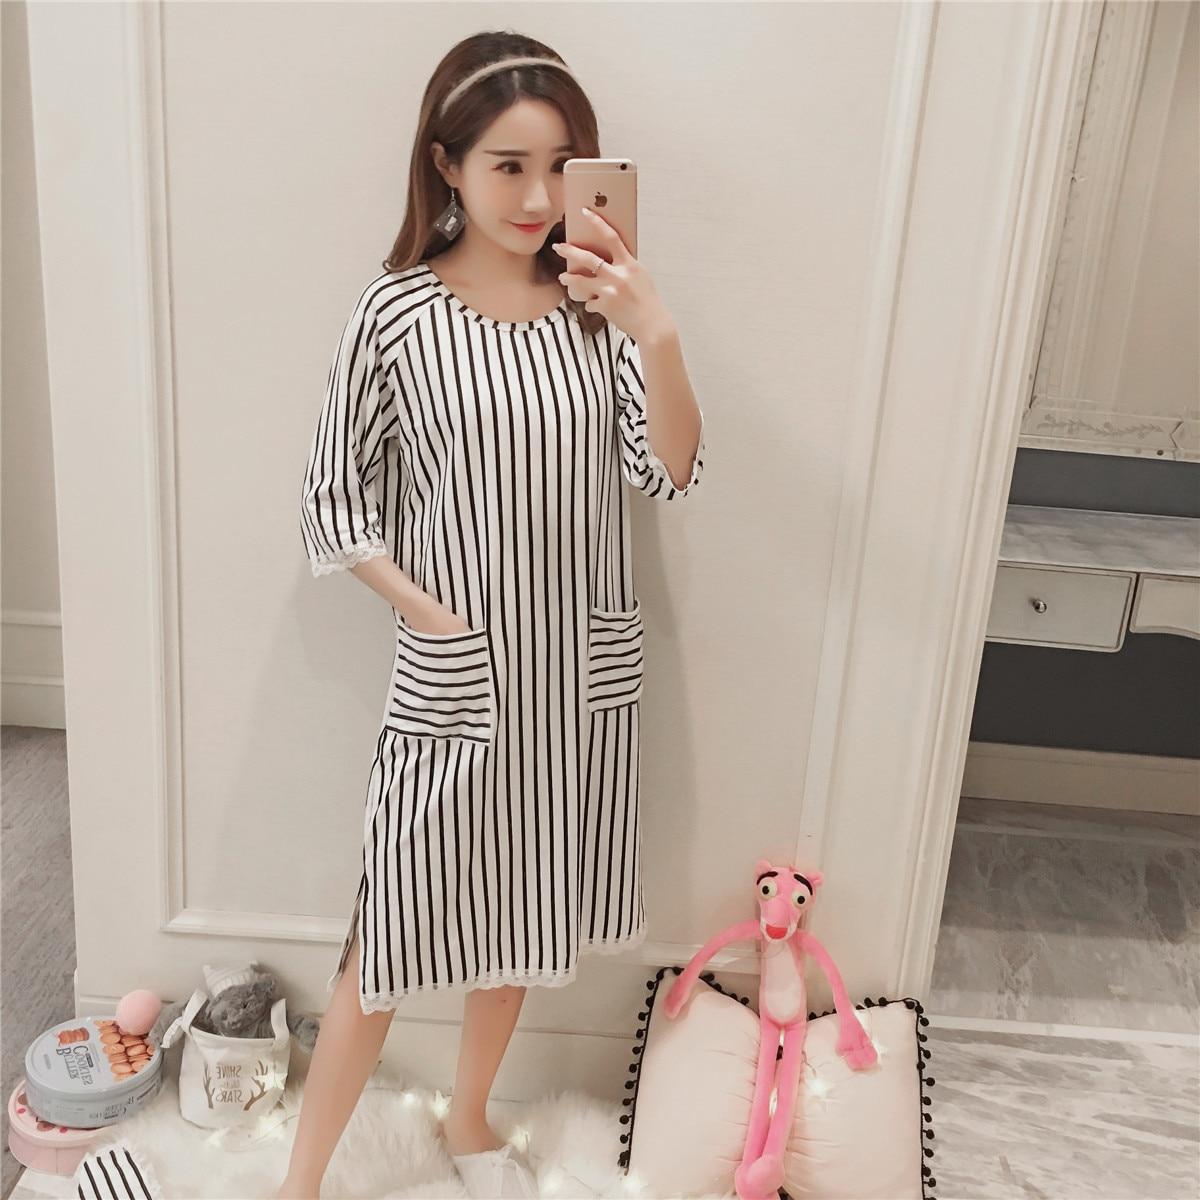 Cotton Nightgowns Sleepshirts for women 2018 Summer Homewear stripe Sleepwear Loose Comfortable Nightdress Indoor cute Clothes